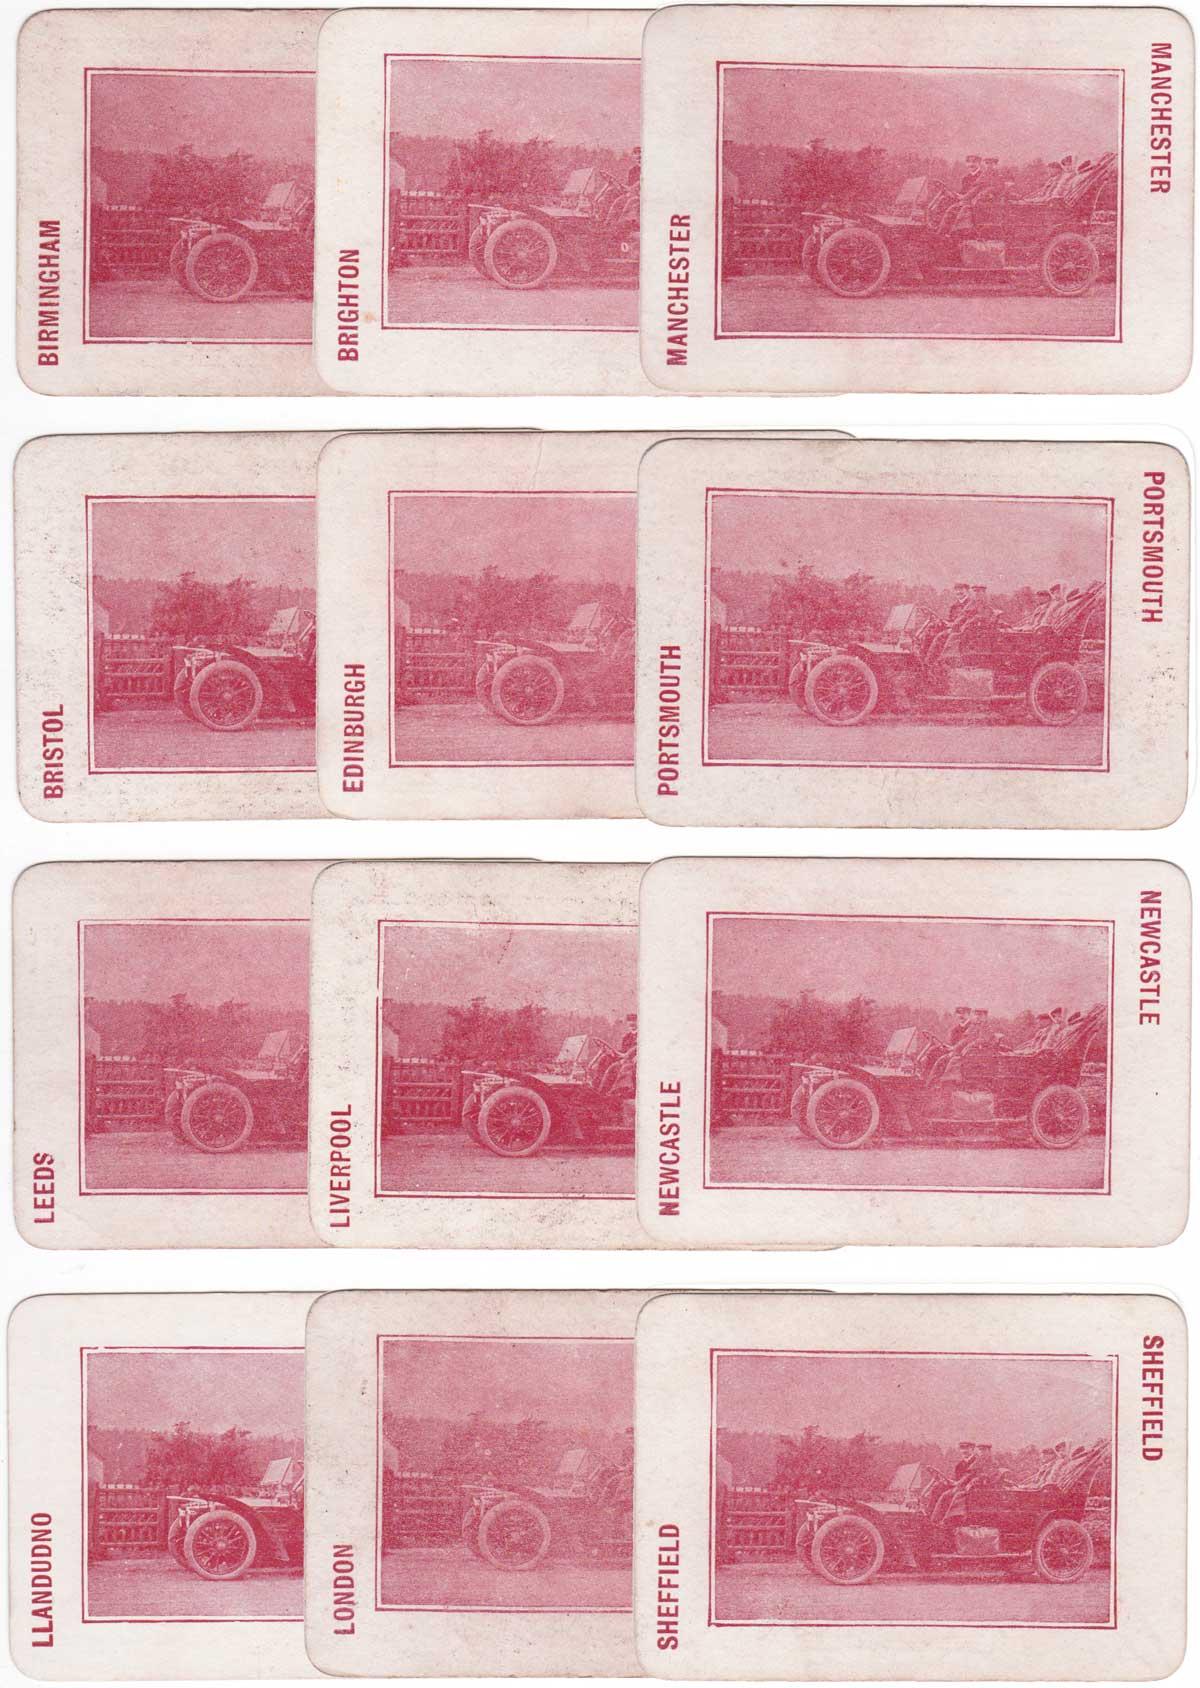 """Tut=Tut; or a Run in a Motor Car"" published by Woolley & Co Ltd, early 1900s"